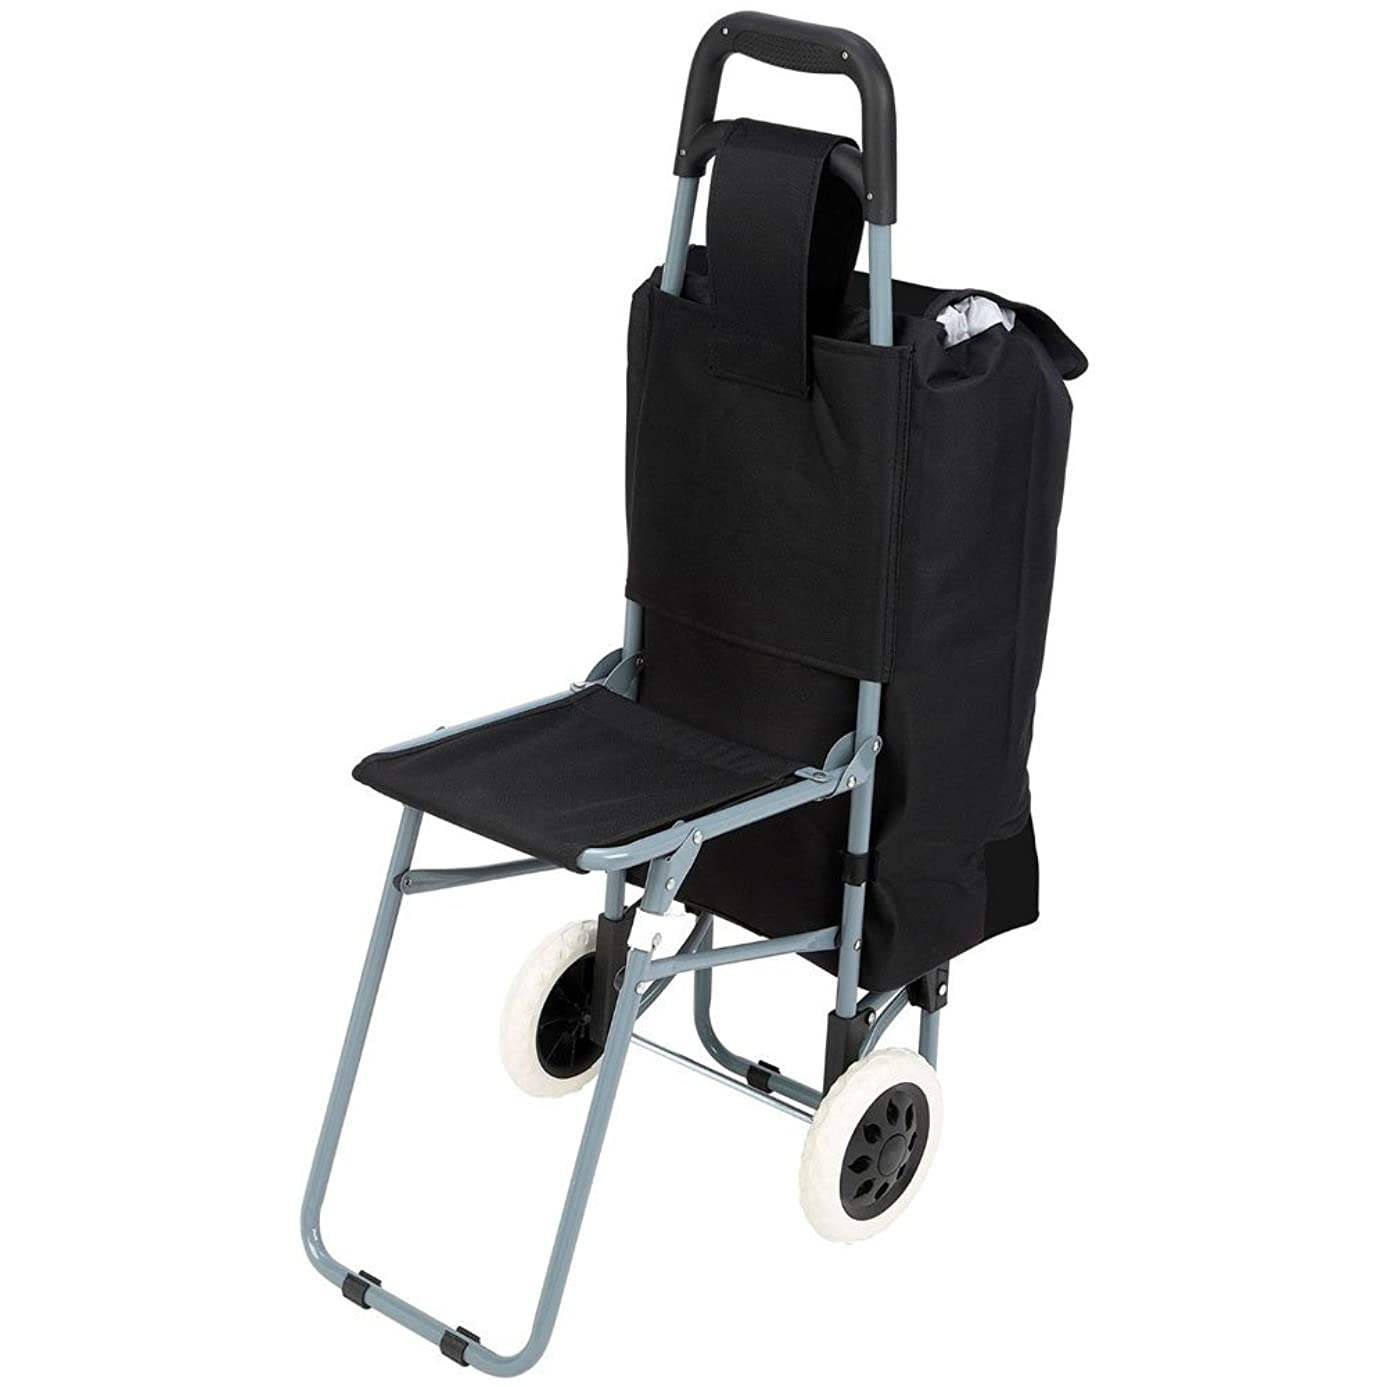 Maxam Trolley Bag with Folding Chair, Black